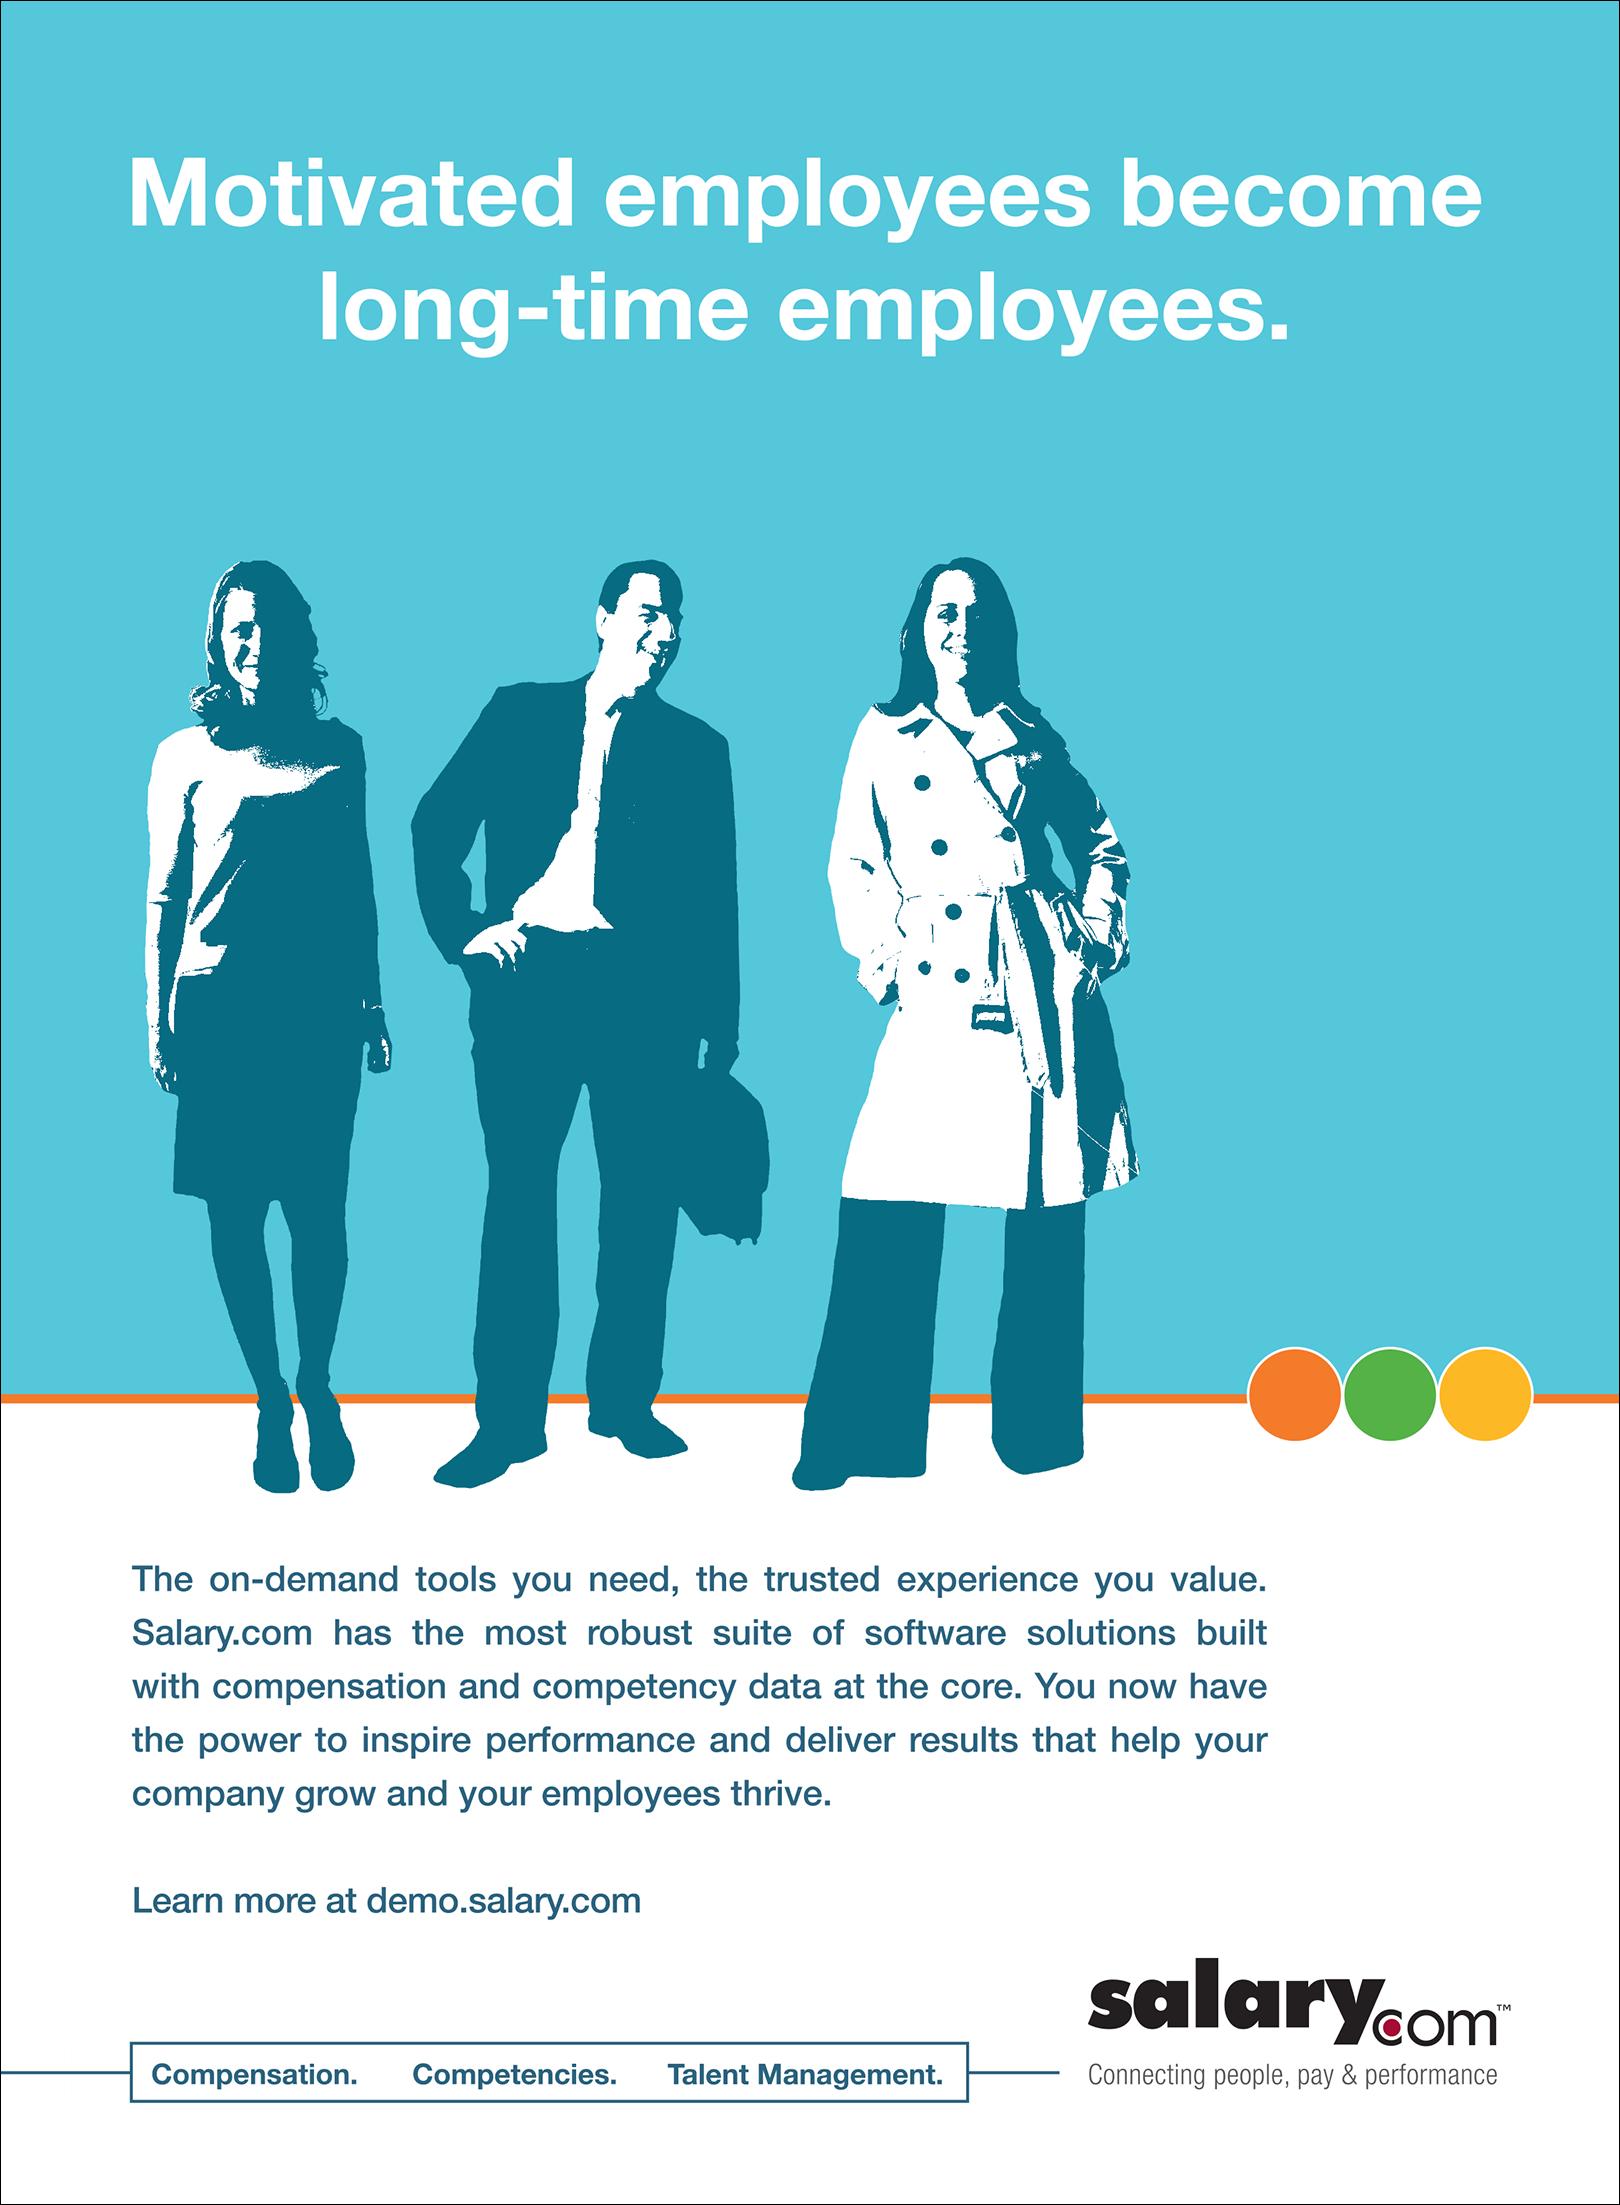 Print Ad for Salary.com